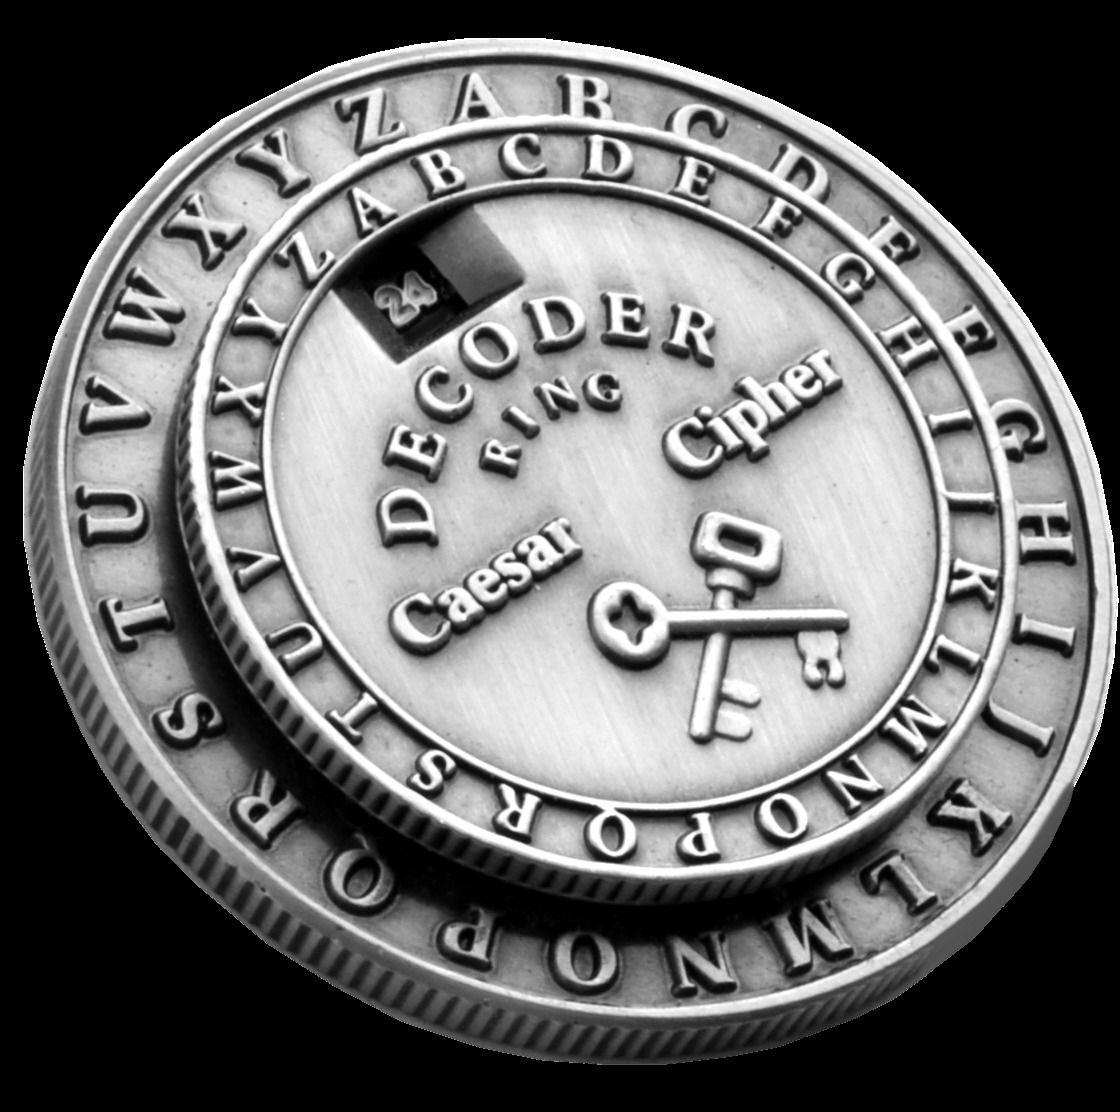 Details about Secret Decoder Ring - Caesar Cipher Medallion (Little